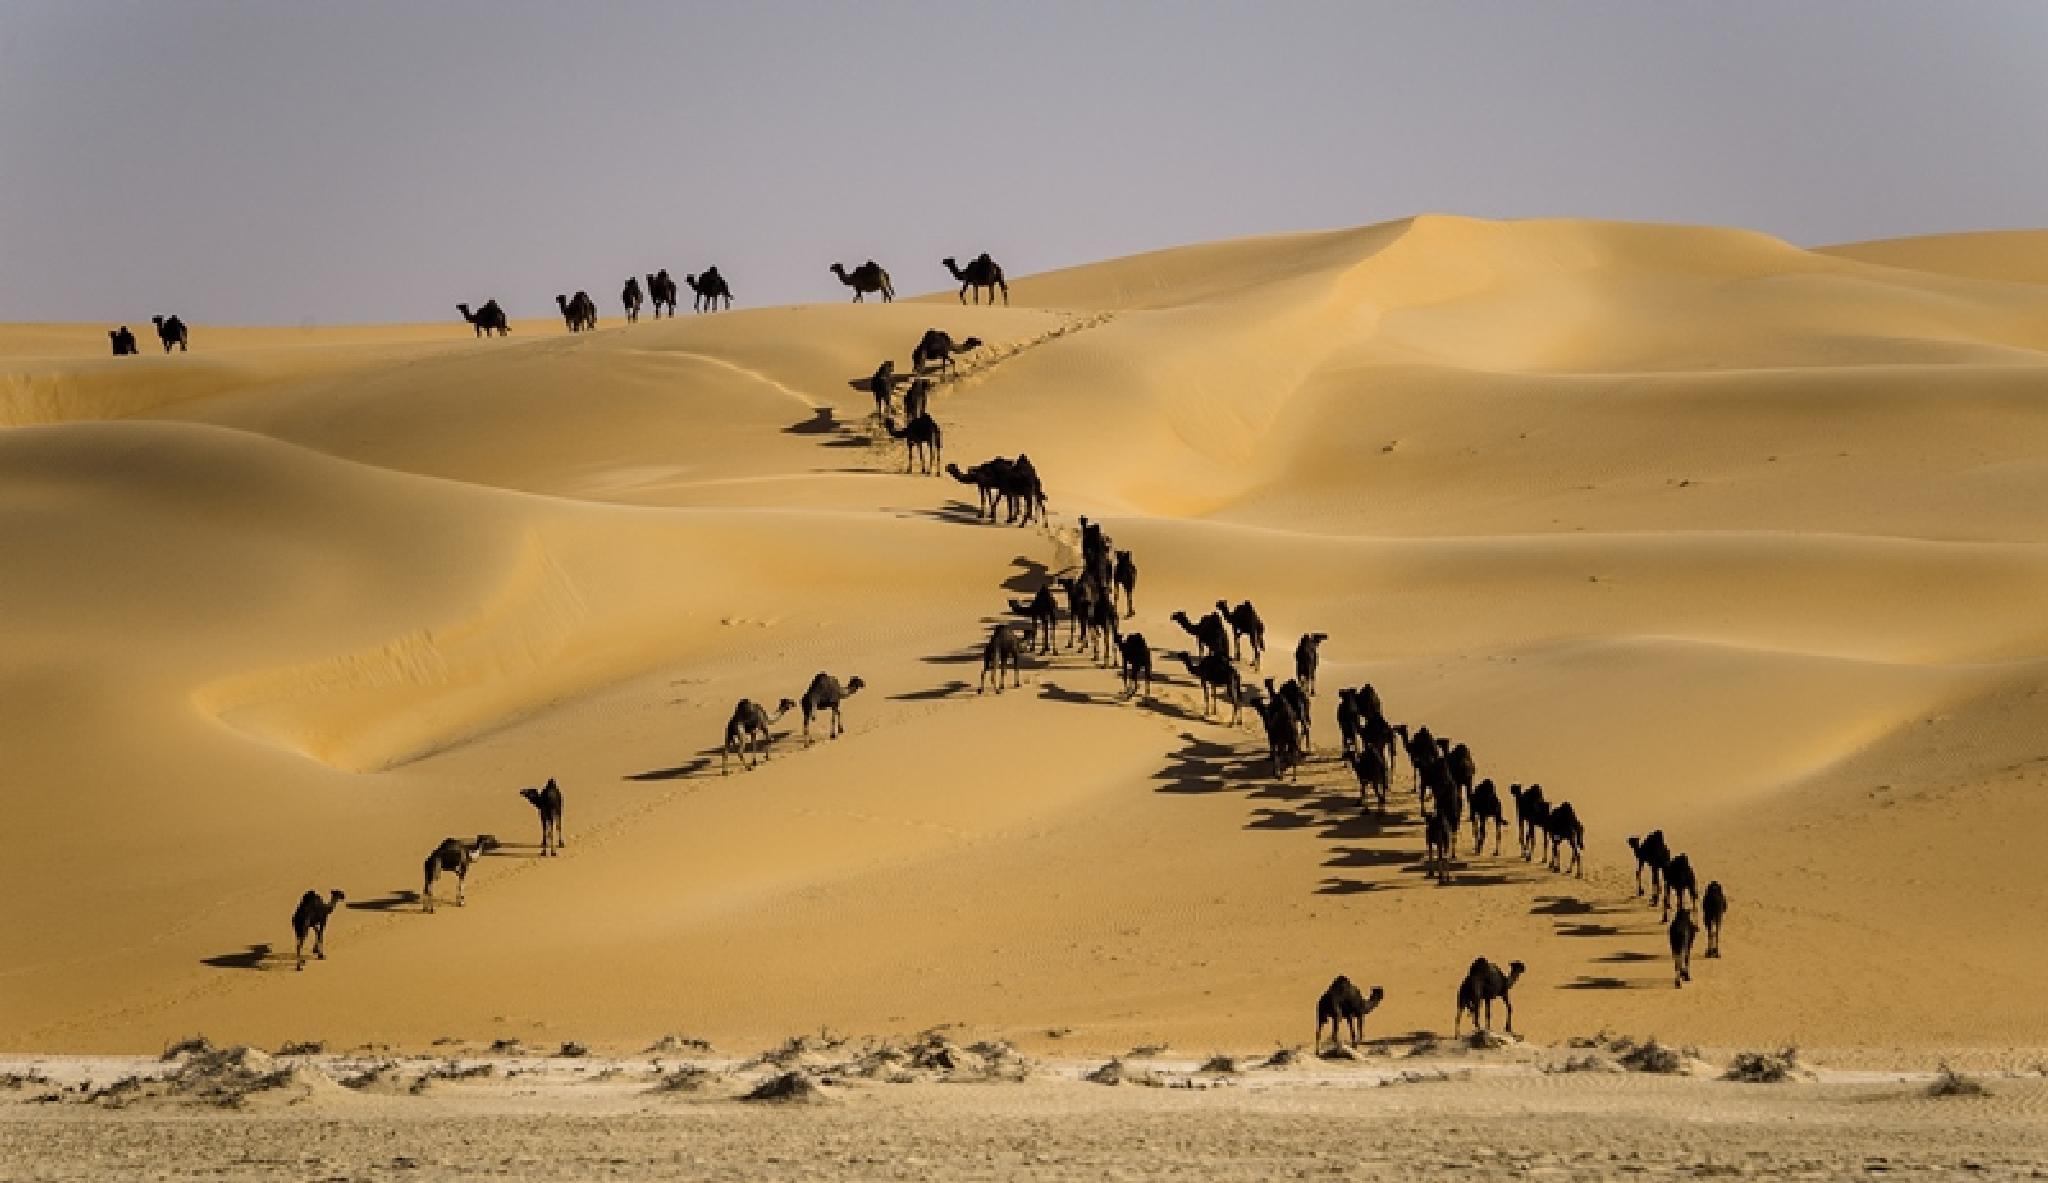 Everyone in one direction by adeeb alani